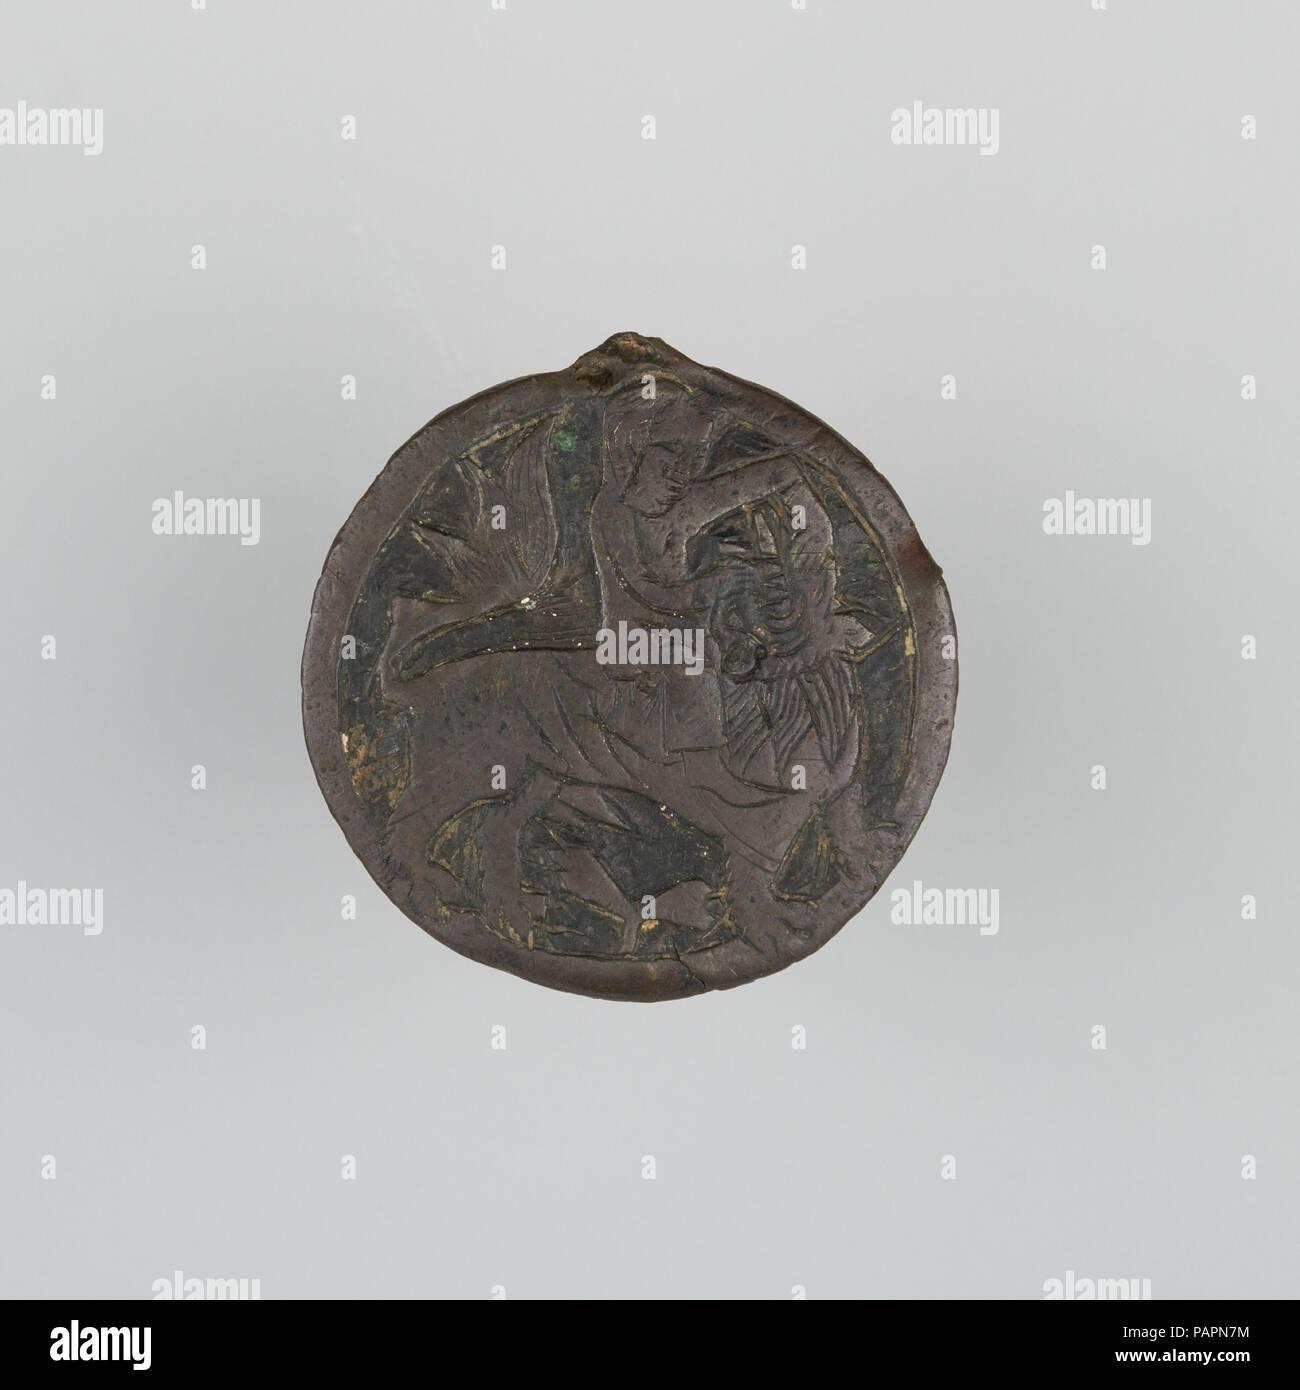 Badge. Culture: Spanish. Dimensions: Diam. 2 3/16 in. (5.5 cm); Wt. 1 oz. (28.3 g). Date: 14th century. Museum: Metropolitan Museum of Art, New York, USA. Stock Photo